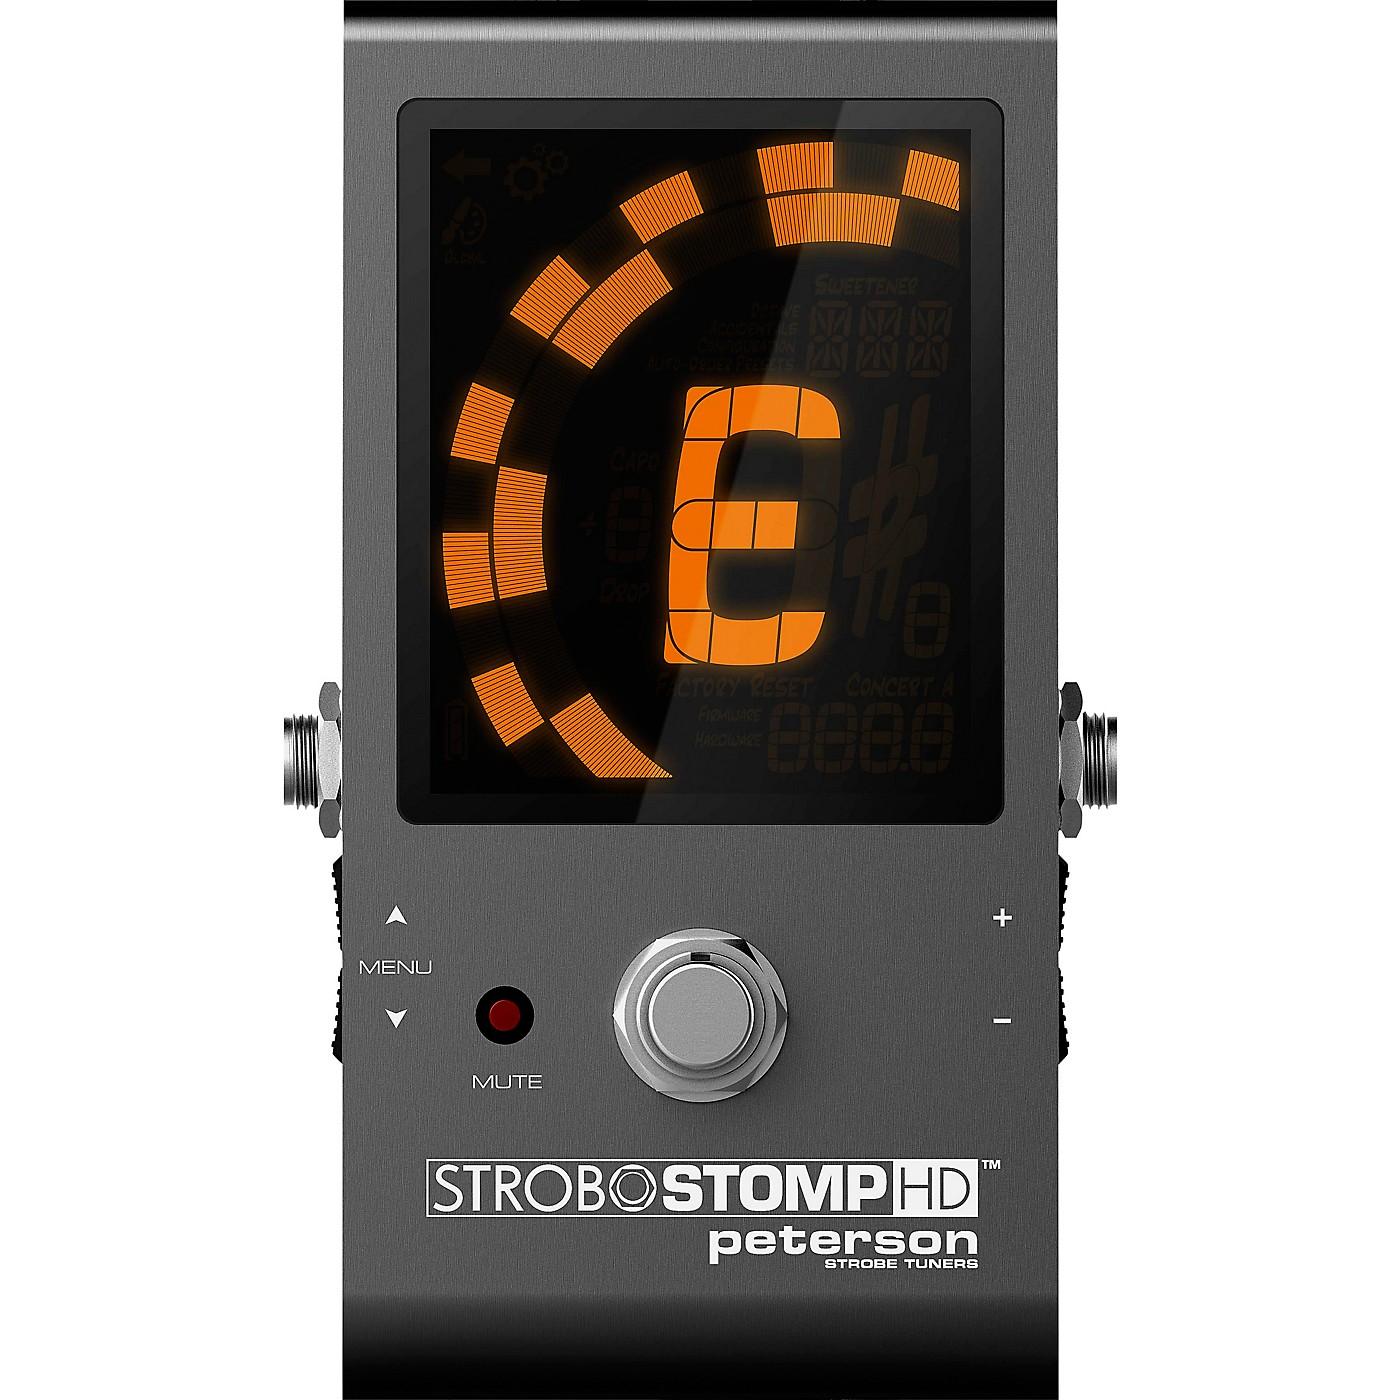 Peterson StroboStomp HD Tuner Pedal thumbnail